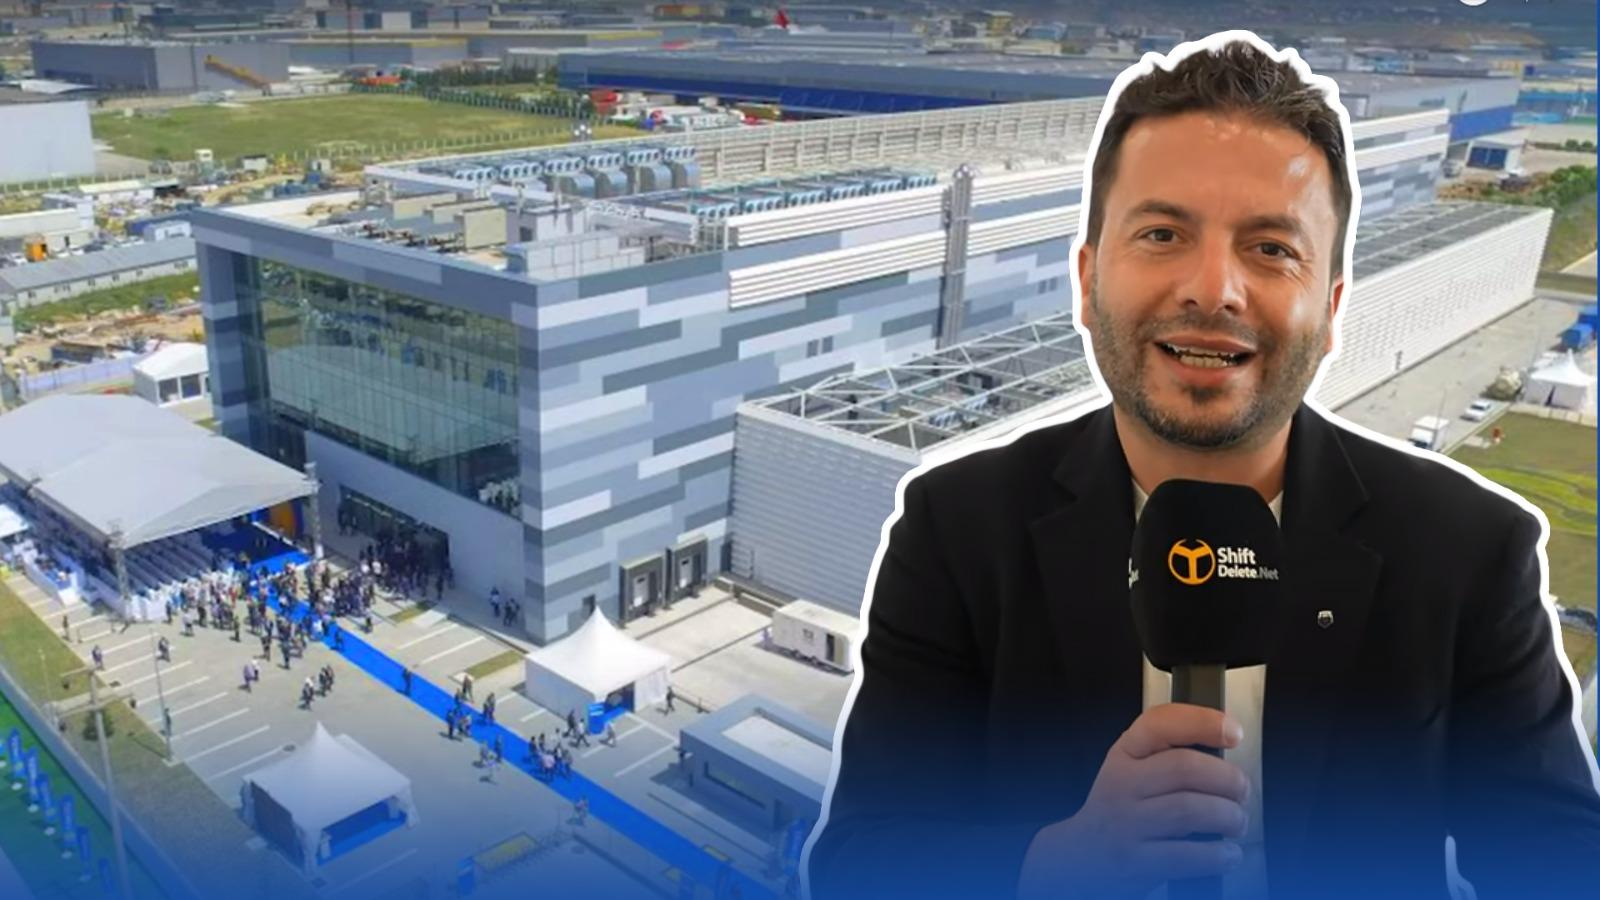 Turkcell Avrupa Veri Merkezi açıldı!